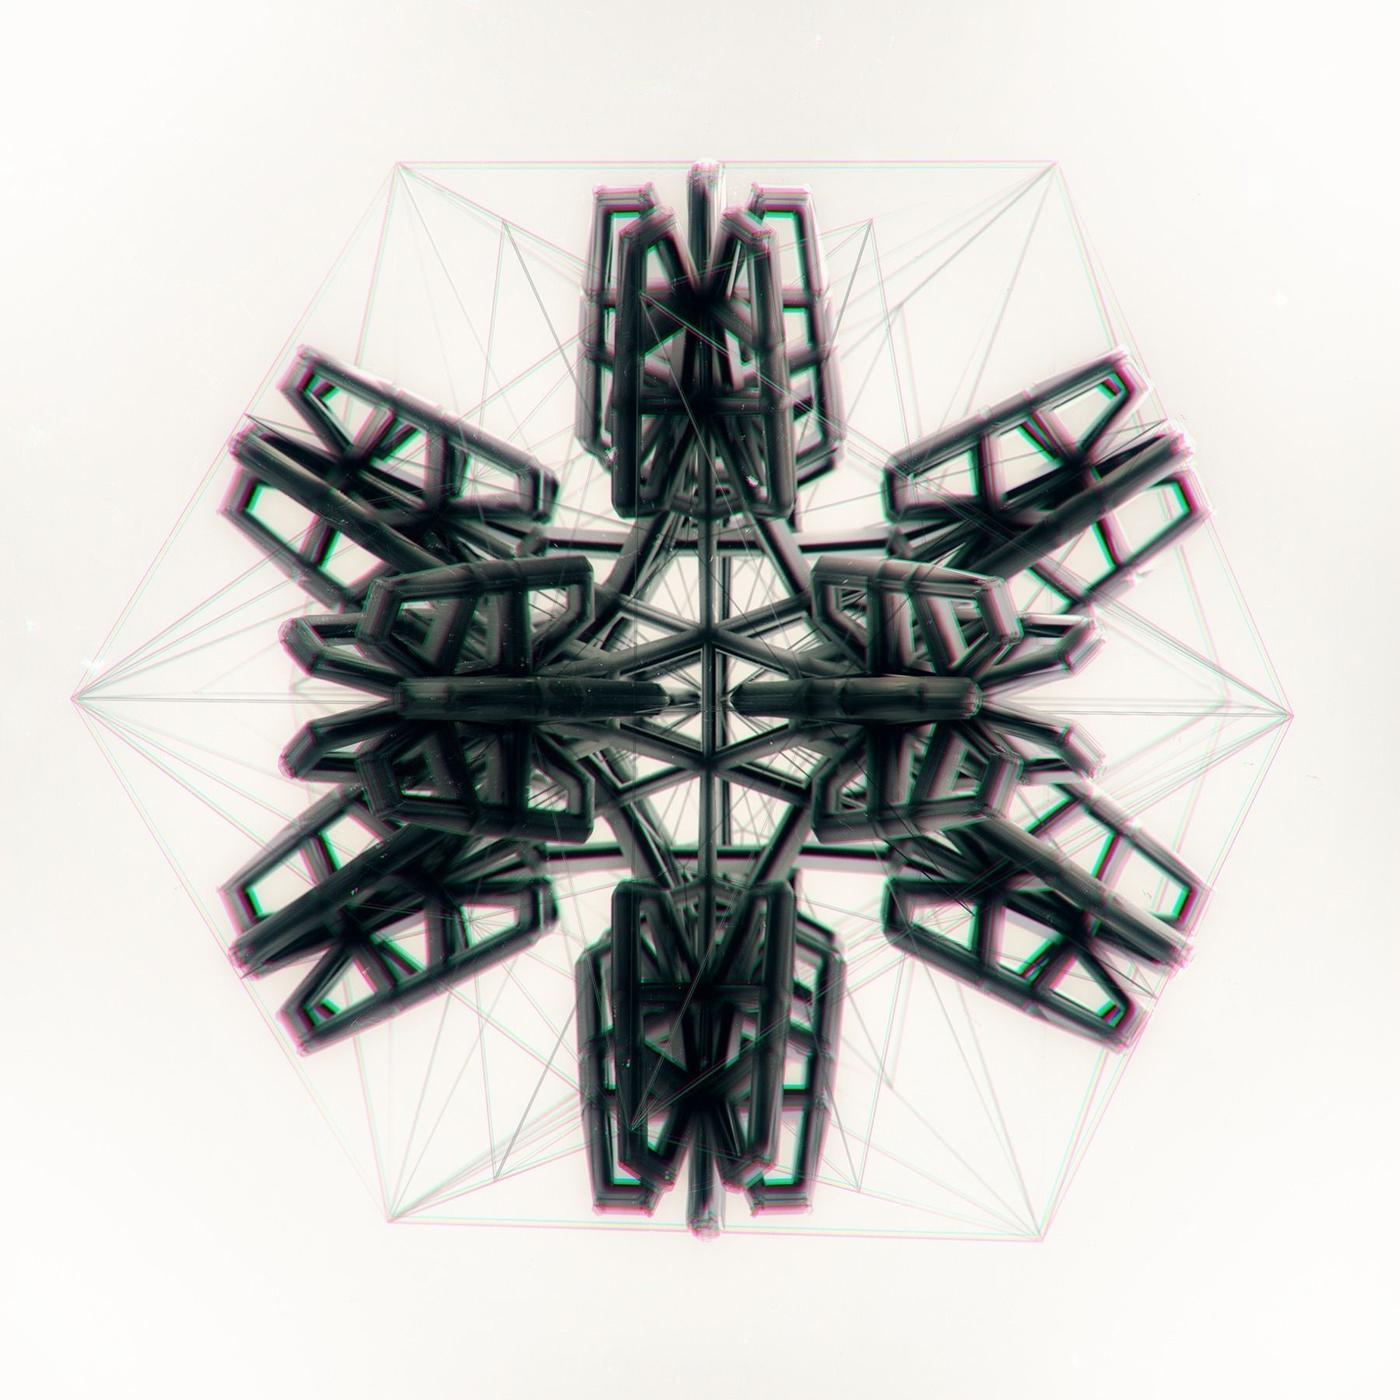 generative artwork